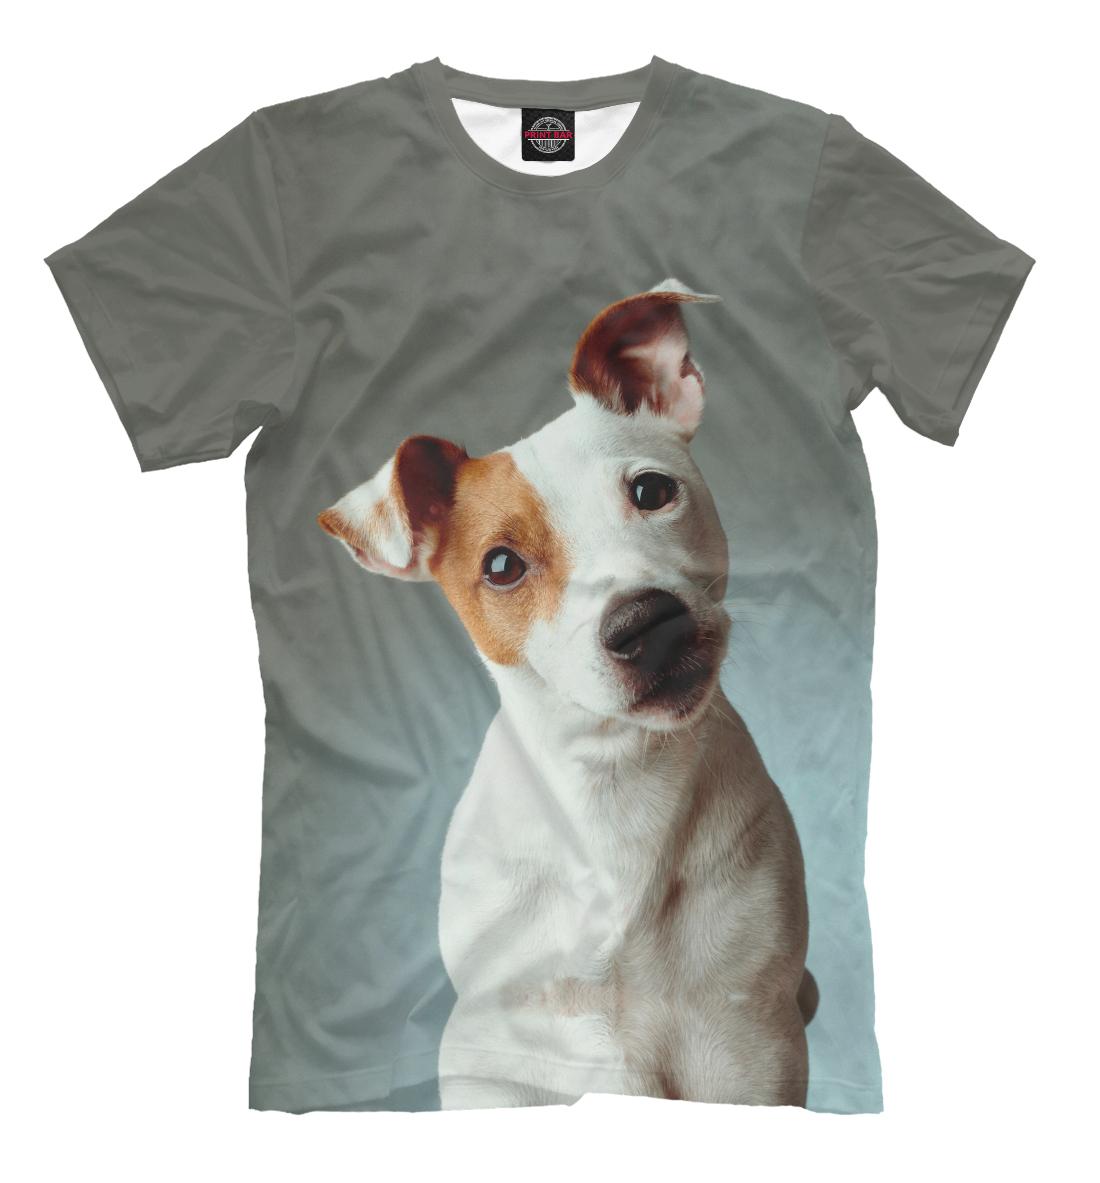 Фото - Jack Russell Terrier muriel p lee scottish terrier